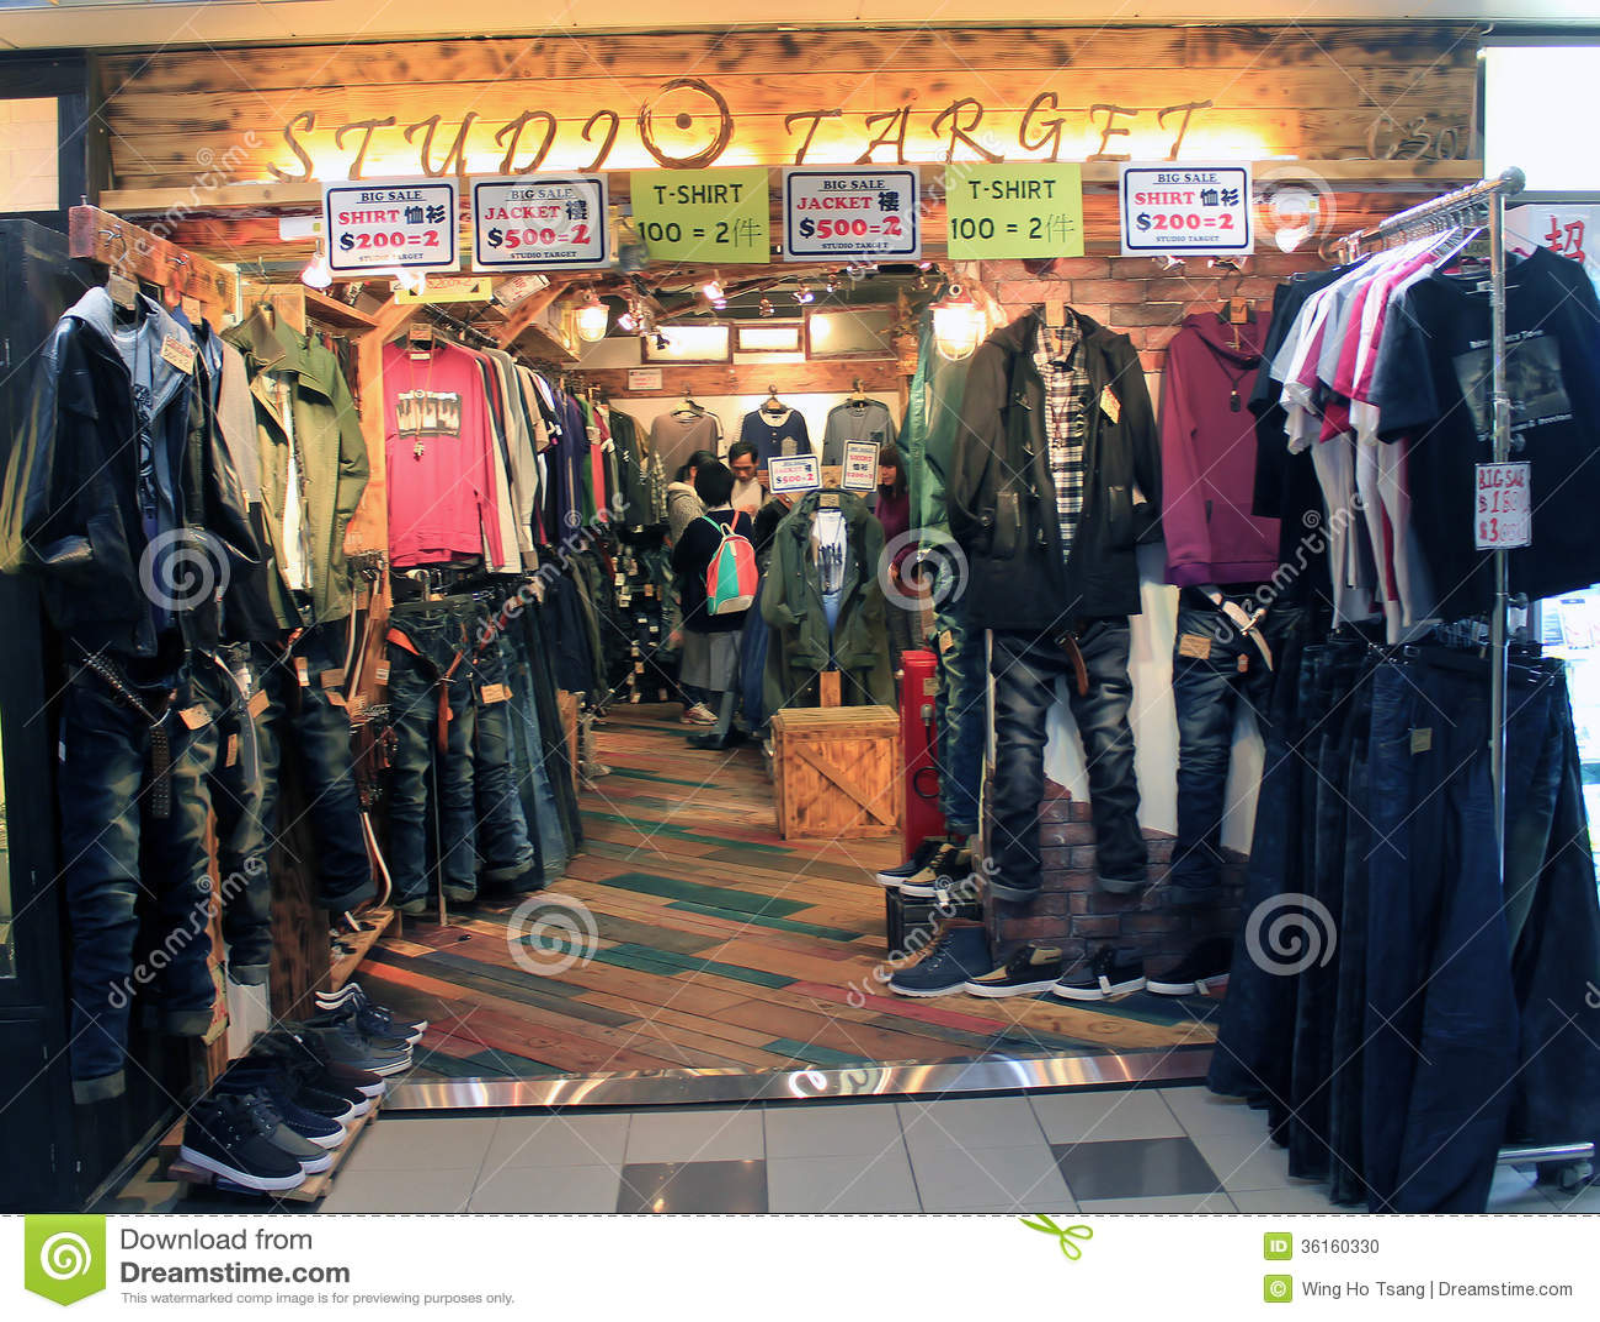 Studio Target Shop In Hong Kong Editorial Image - Image of